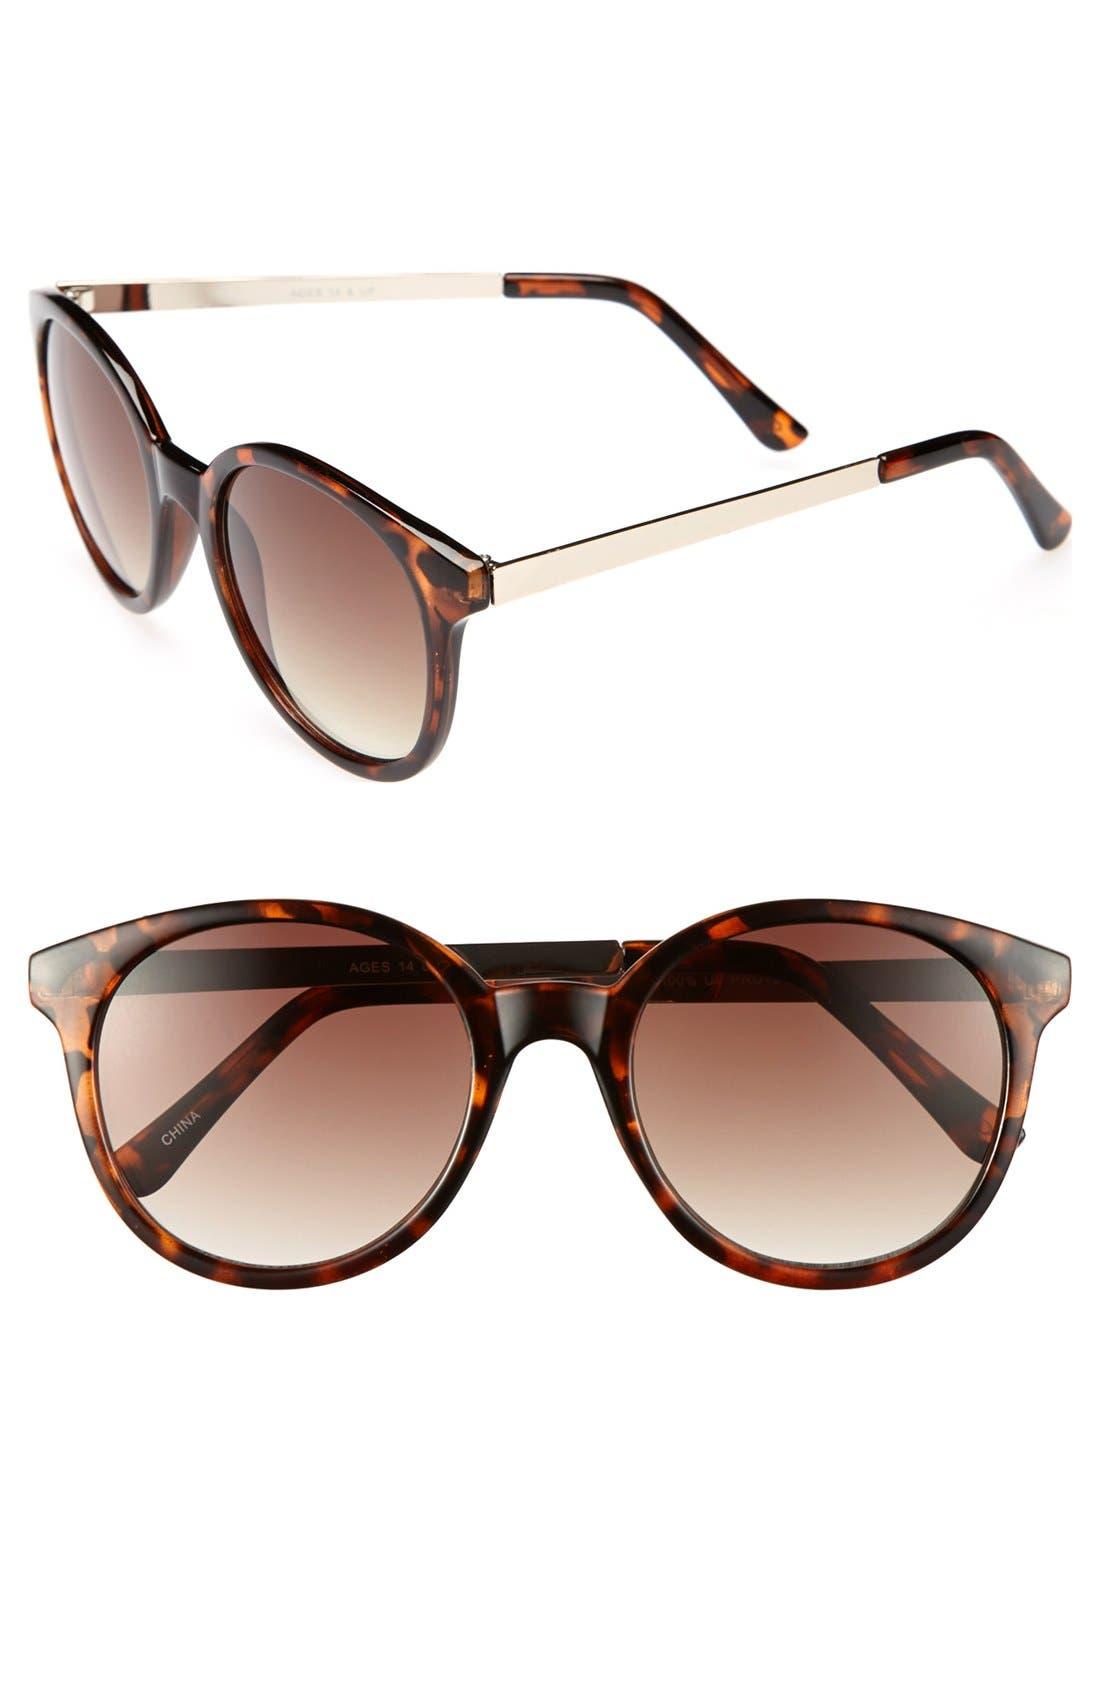 Alternate Image 1 Selected - FE NY Vintage Sunglasses